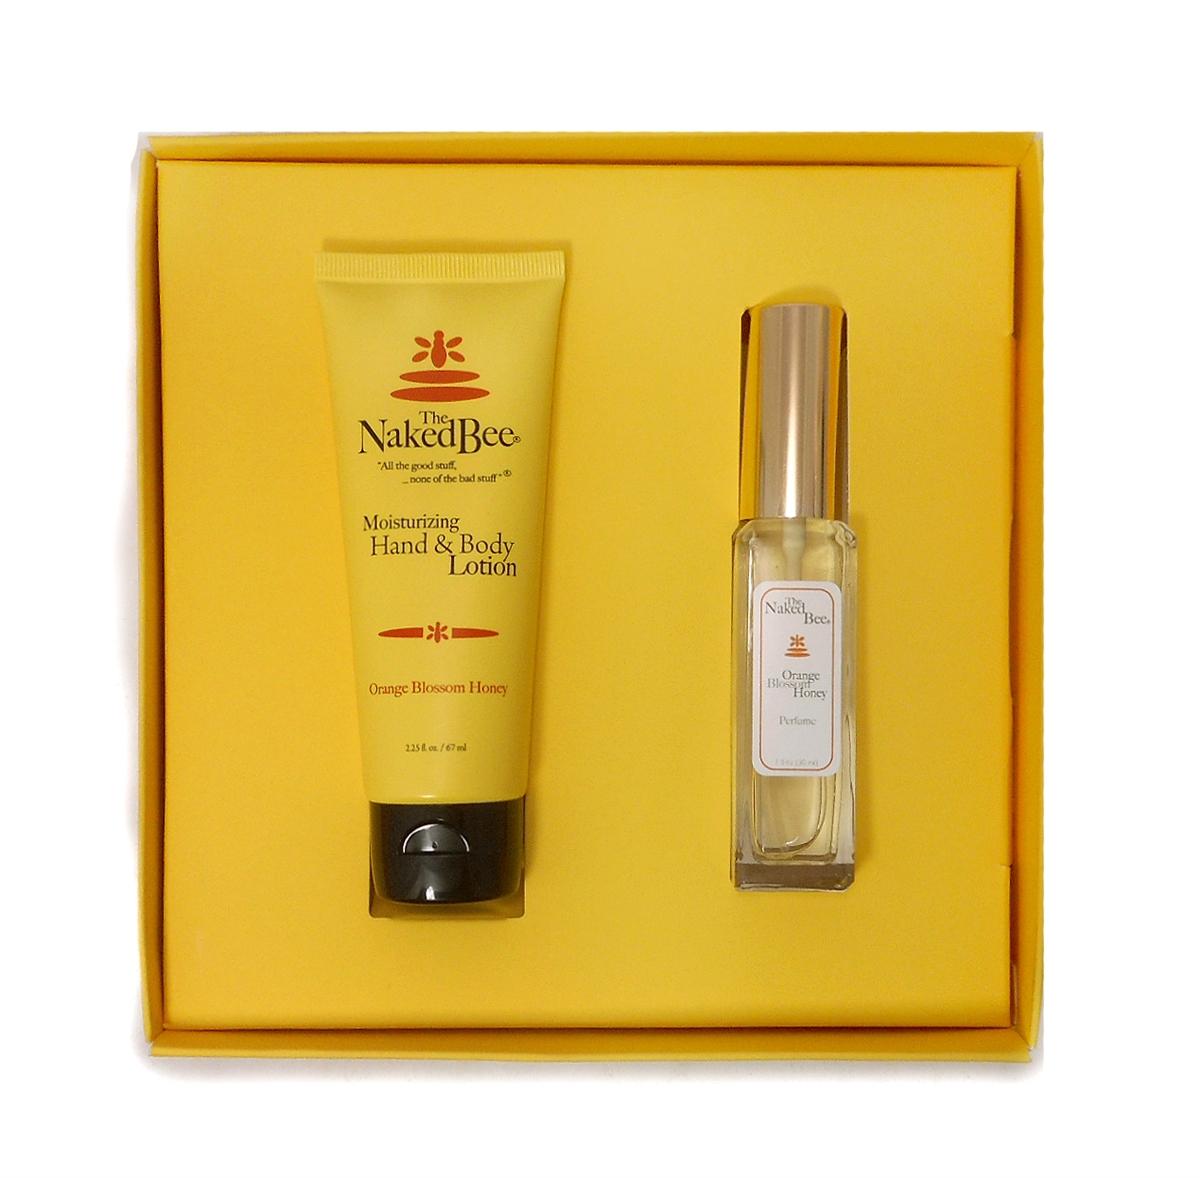 The Naked Bee Orange Blossom Perfume: Canada, Ontario. The